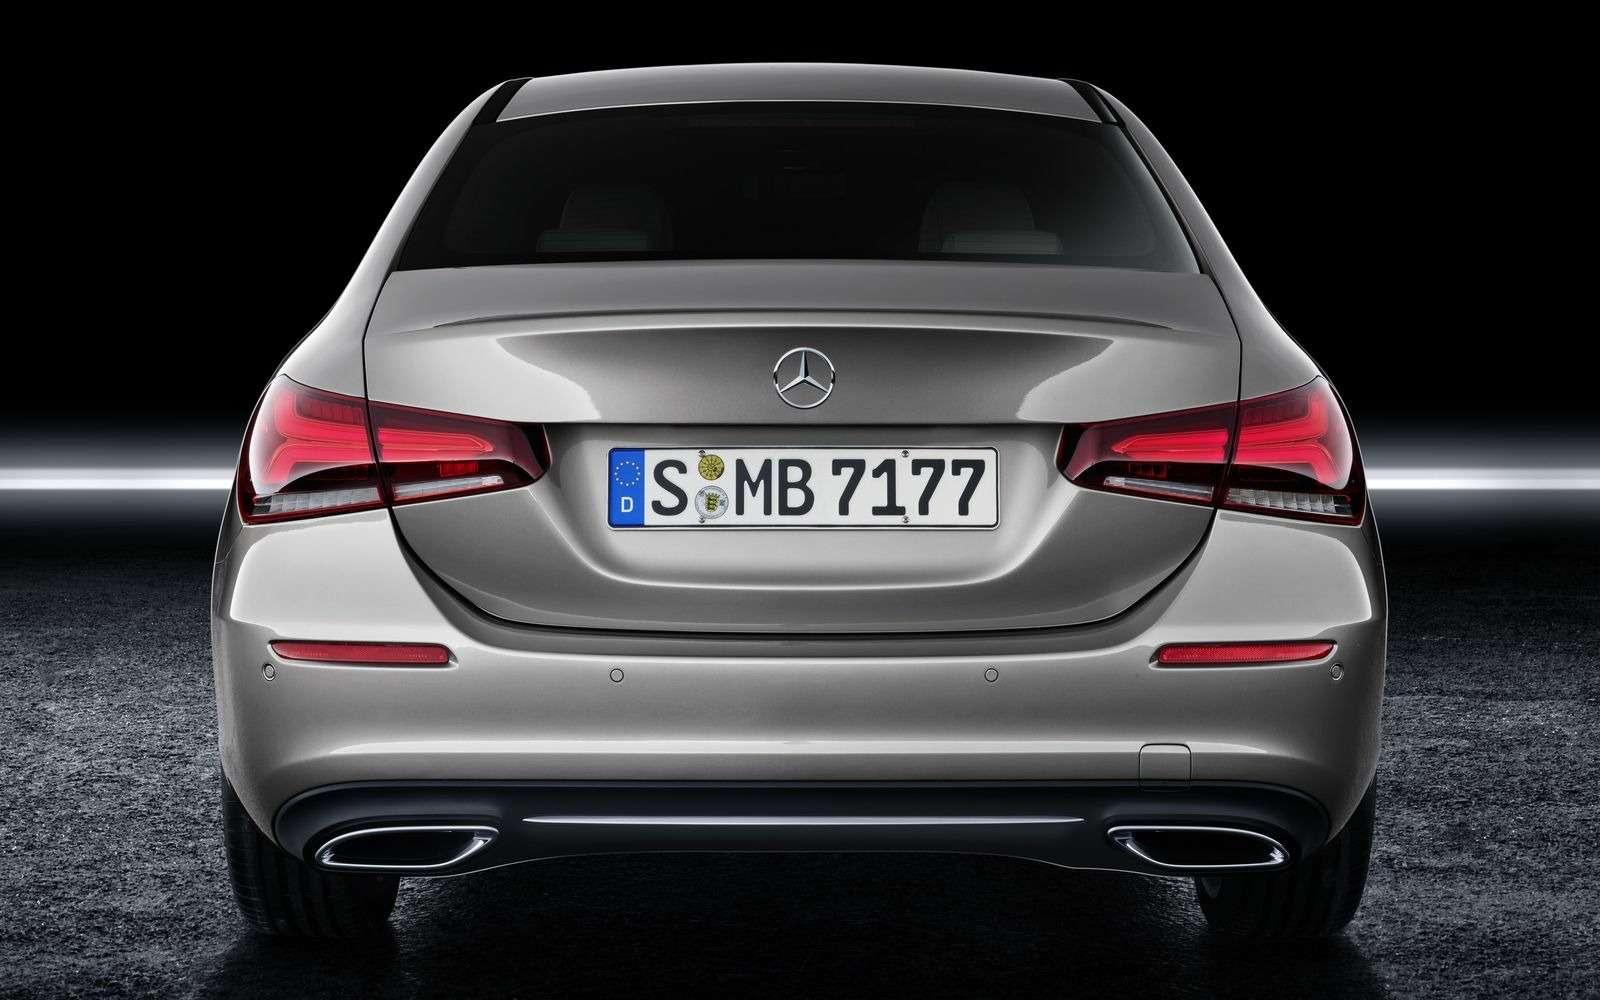 Евростандарт: представлен короткий седан Mercedes-Benz A-класса— фото 890431